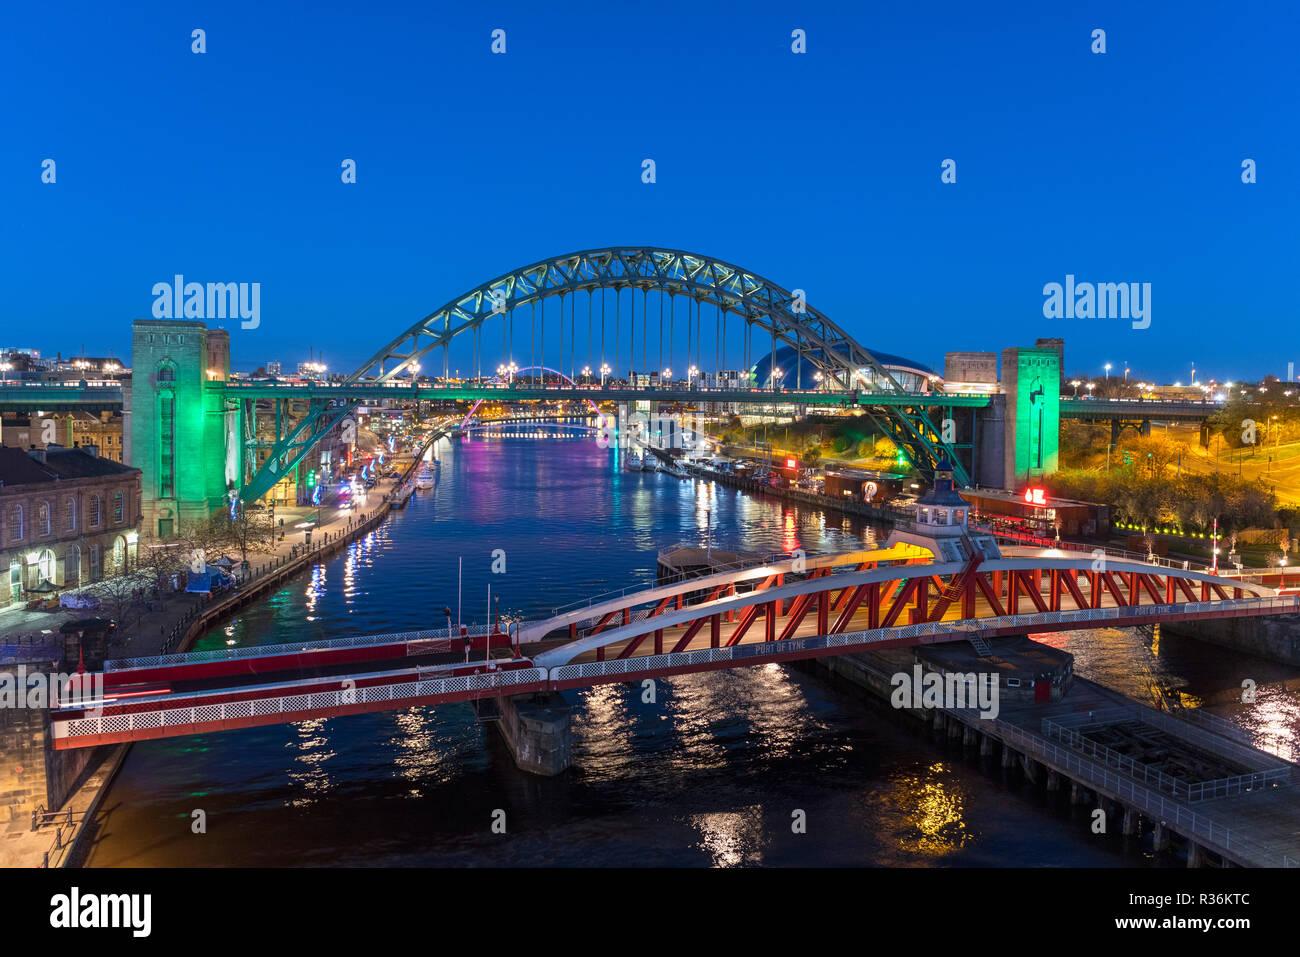 Newcastle bridges. Aerial view of the River Tyne and Tyne Bridge at night, Newcastle upon Tyne, England, UK - Stock Image